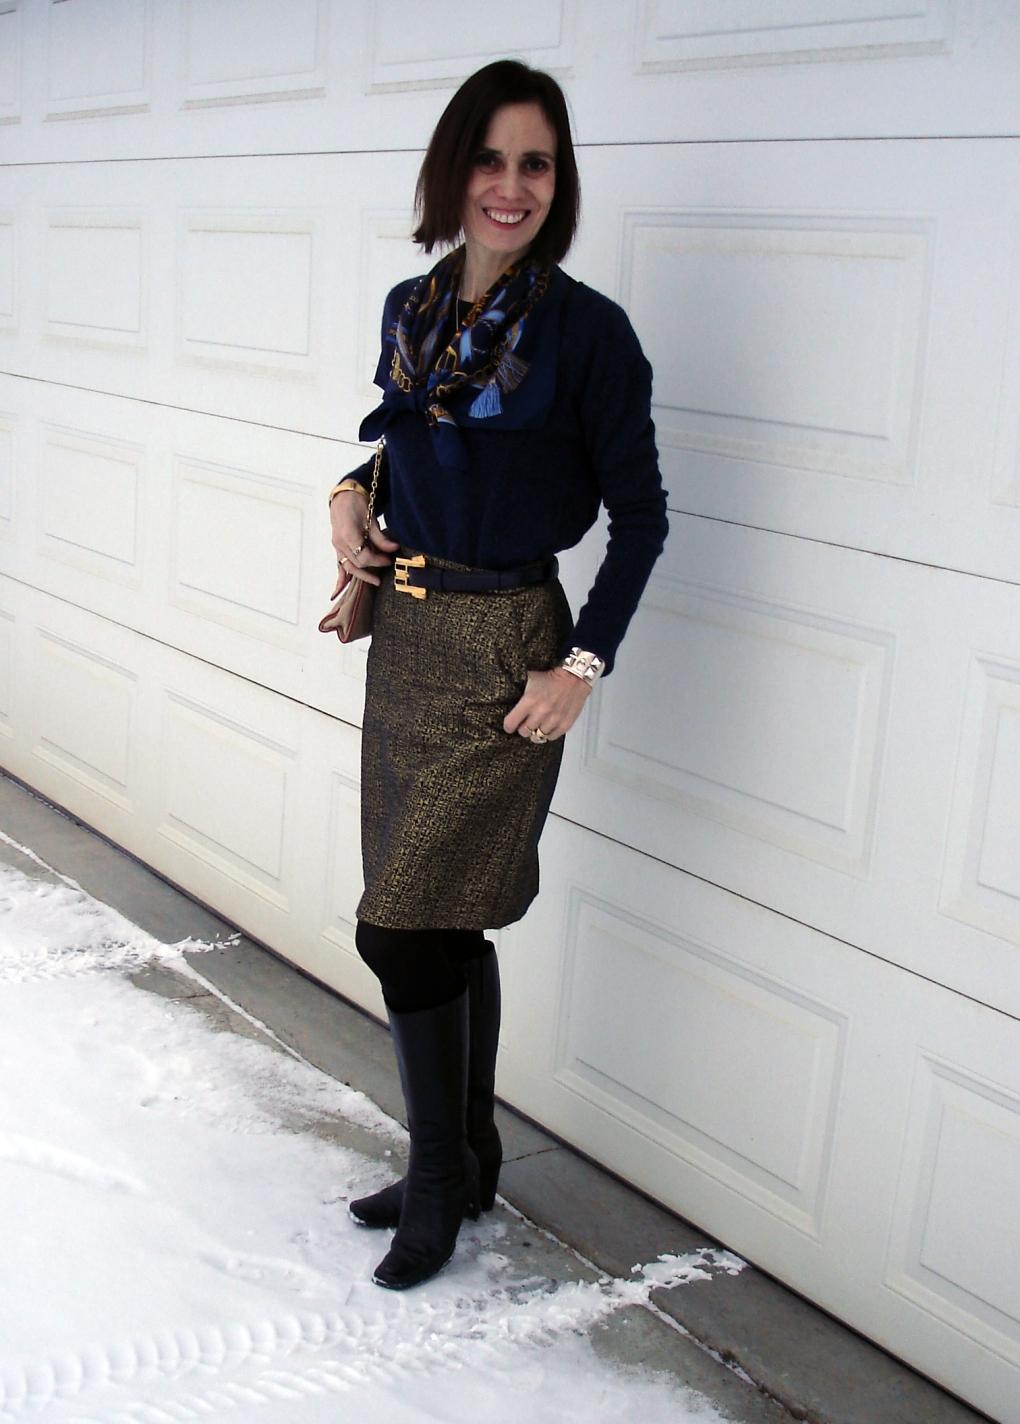 #fashionover40 mature woman wearing a brocade skirt